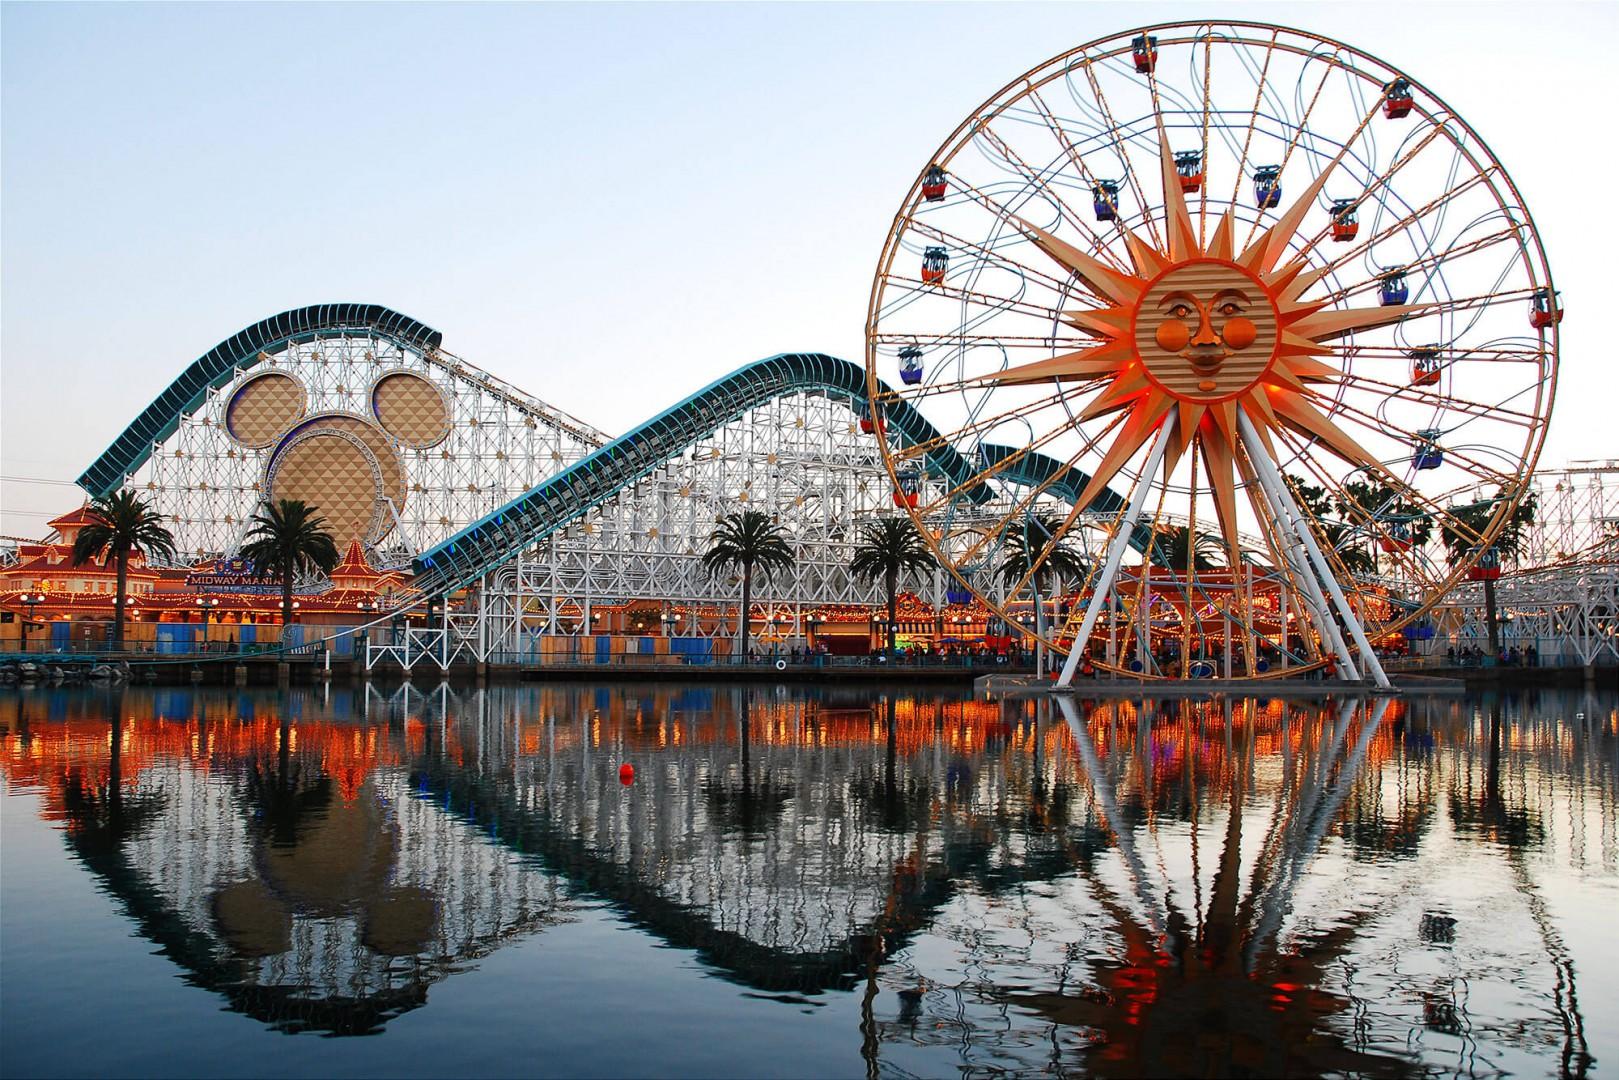 Amusement park located in Anaheim County California